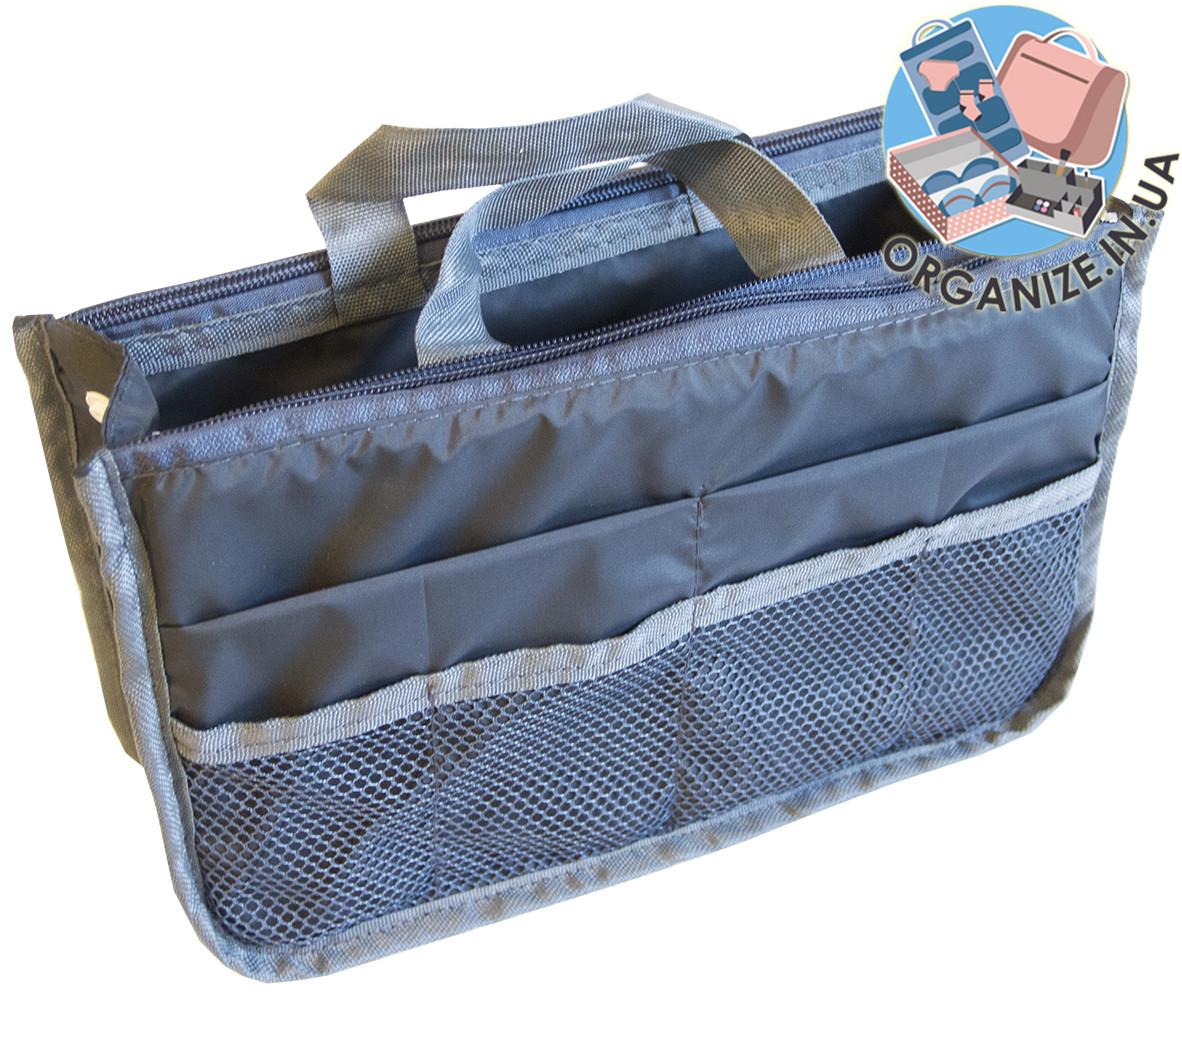 Органайзер-вкладыш для сумки ORGANIZE украинский аналог Bag in Bag (серый)